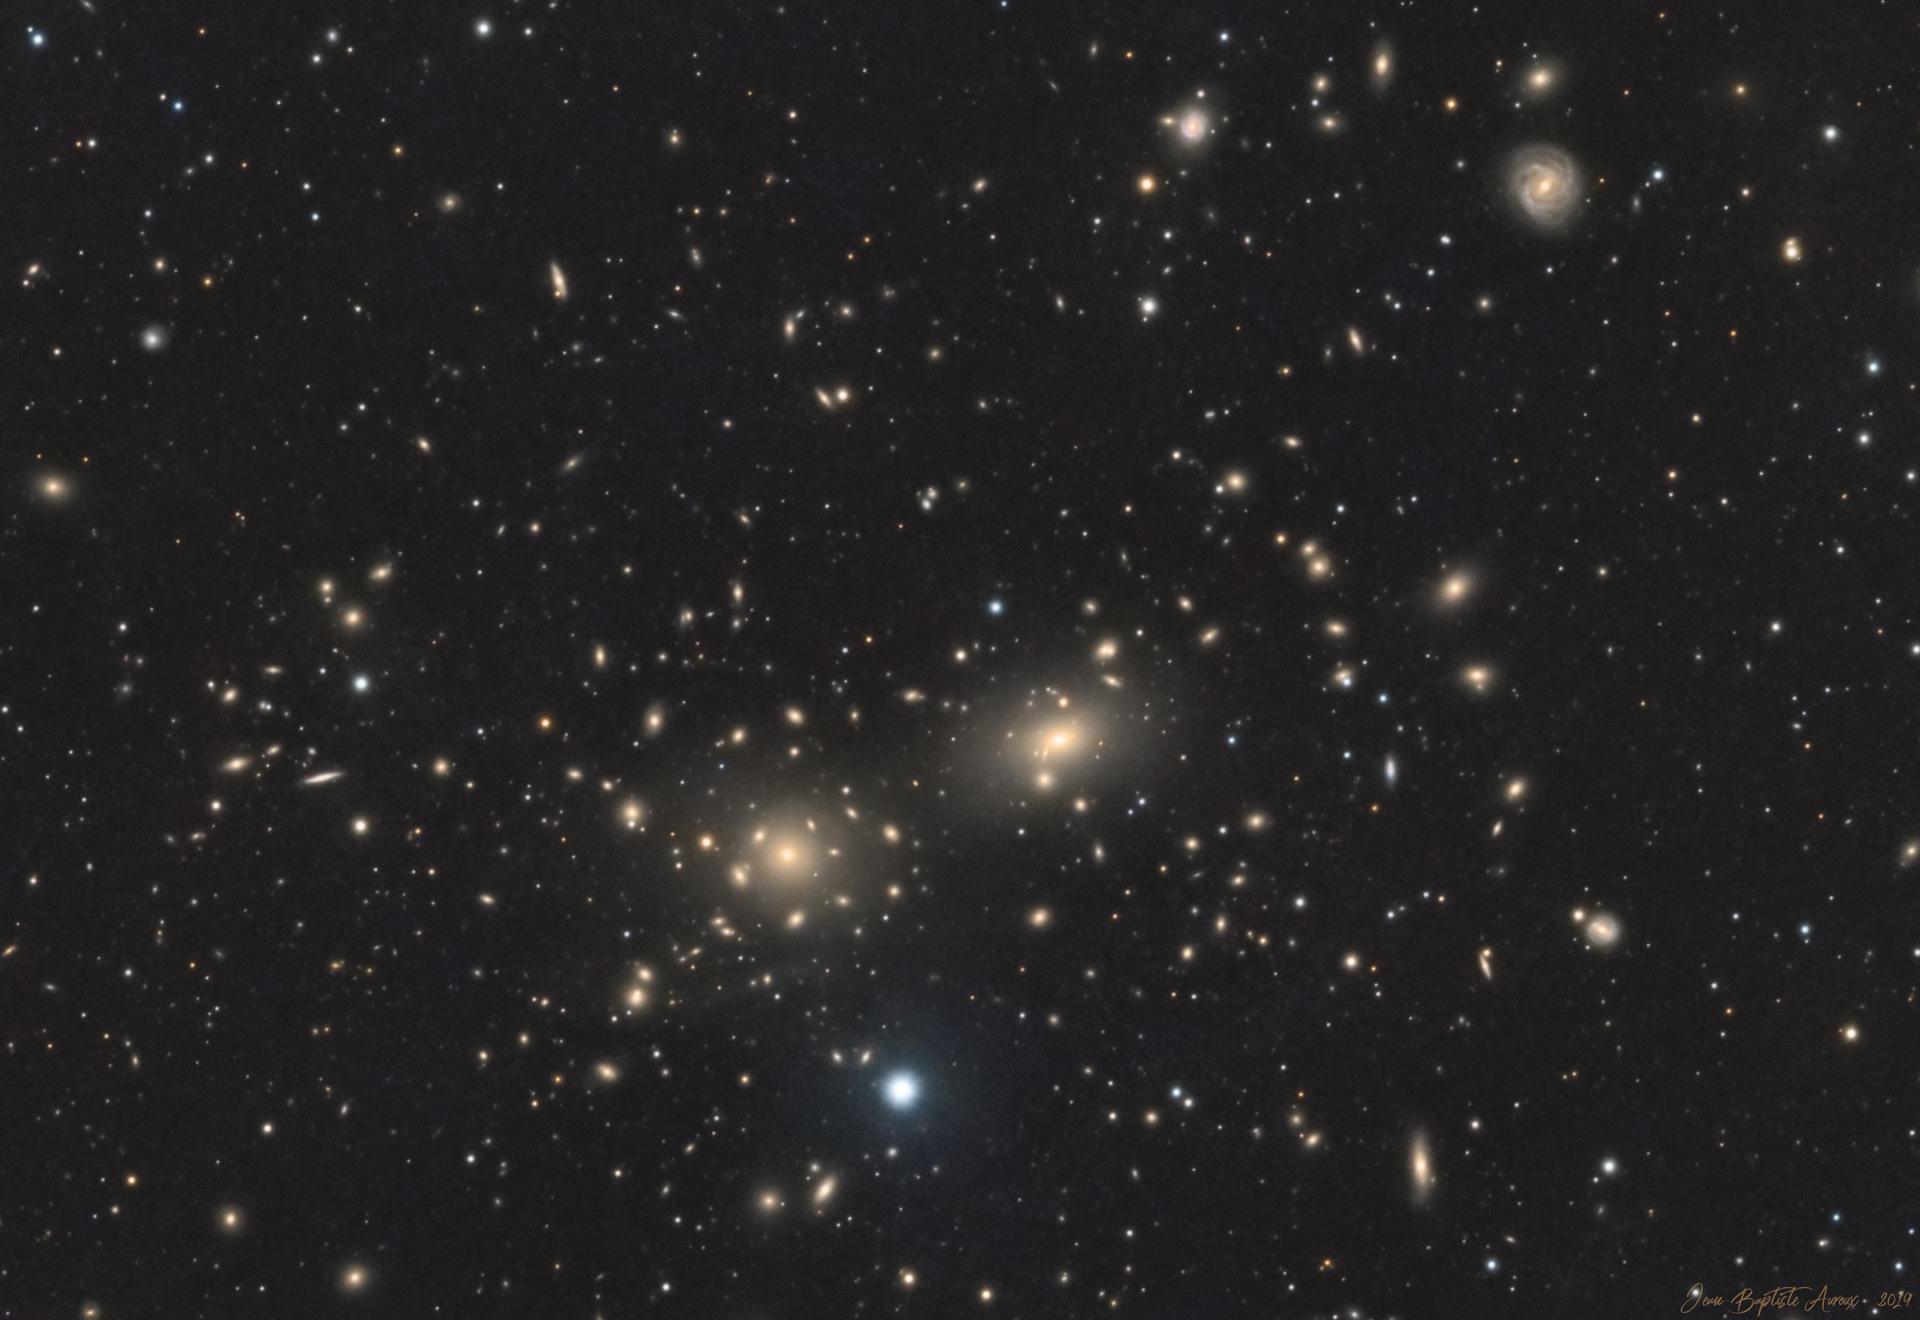 large.Coma_final3_crop.jpg.89158e3adb305caea56b77eef6c4e062.jpg